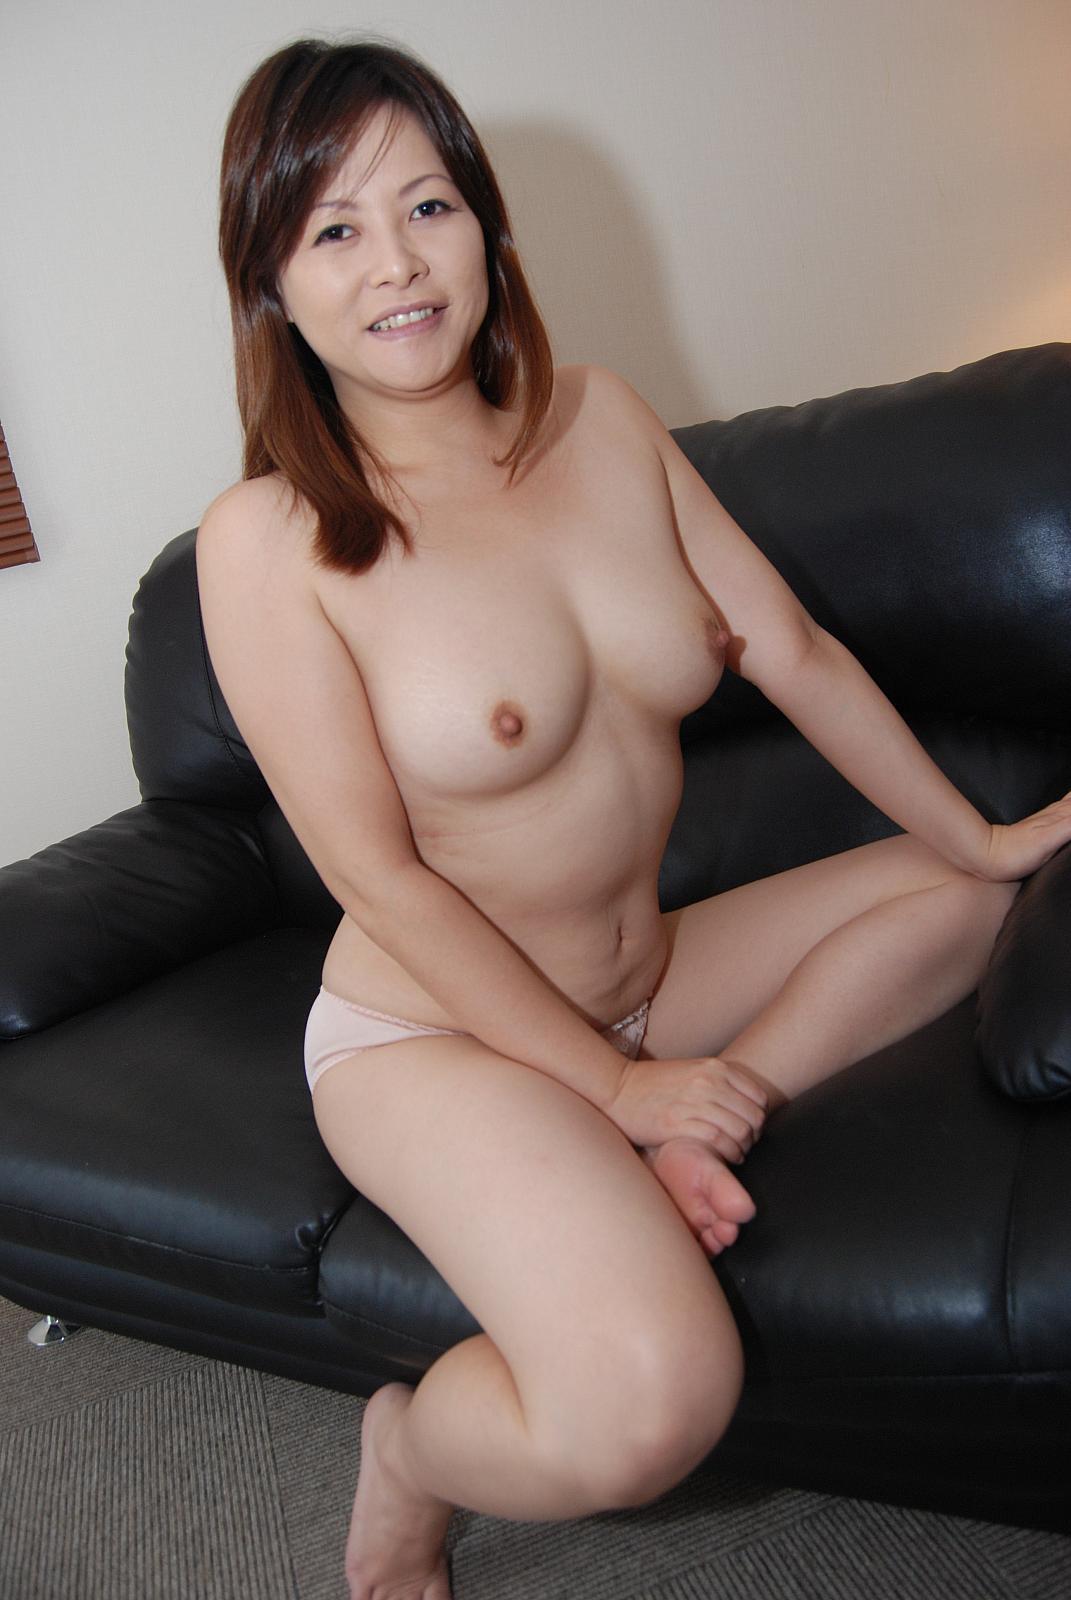 Maiko creampies japanese creampies asian creampies